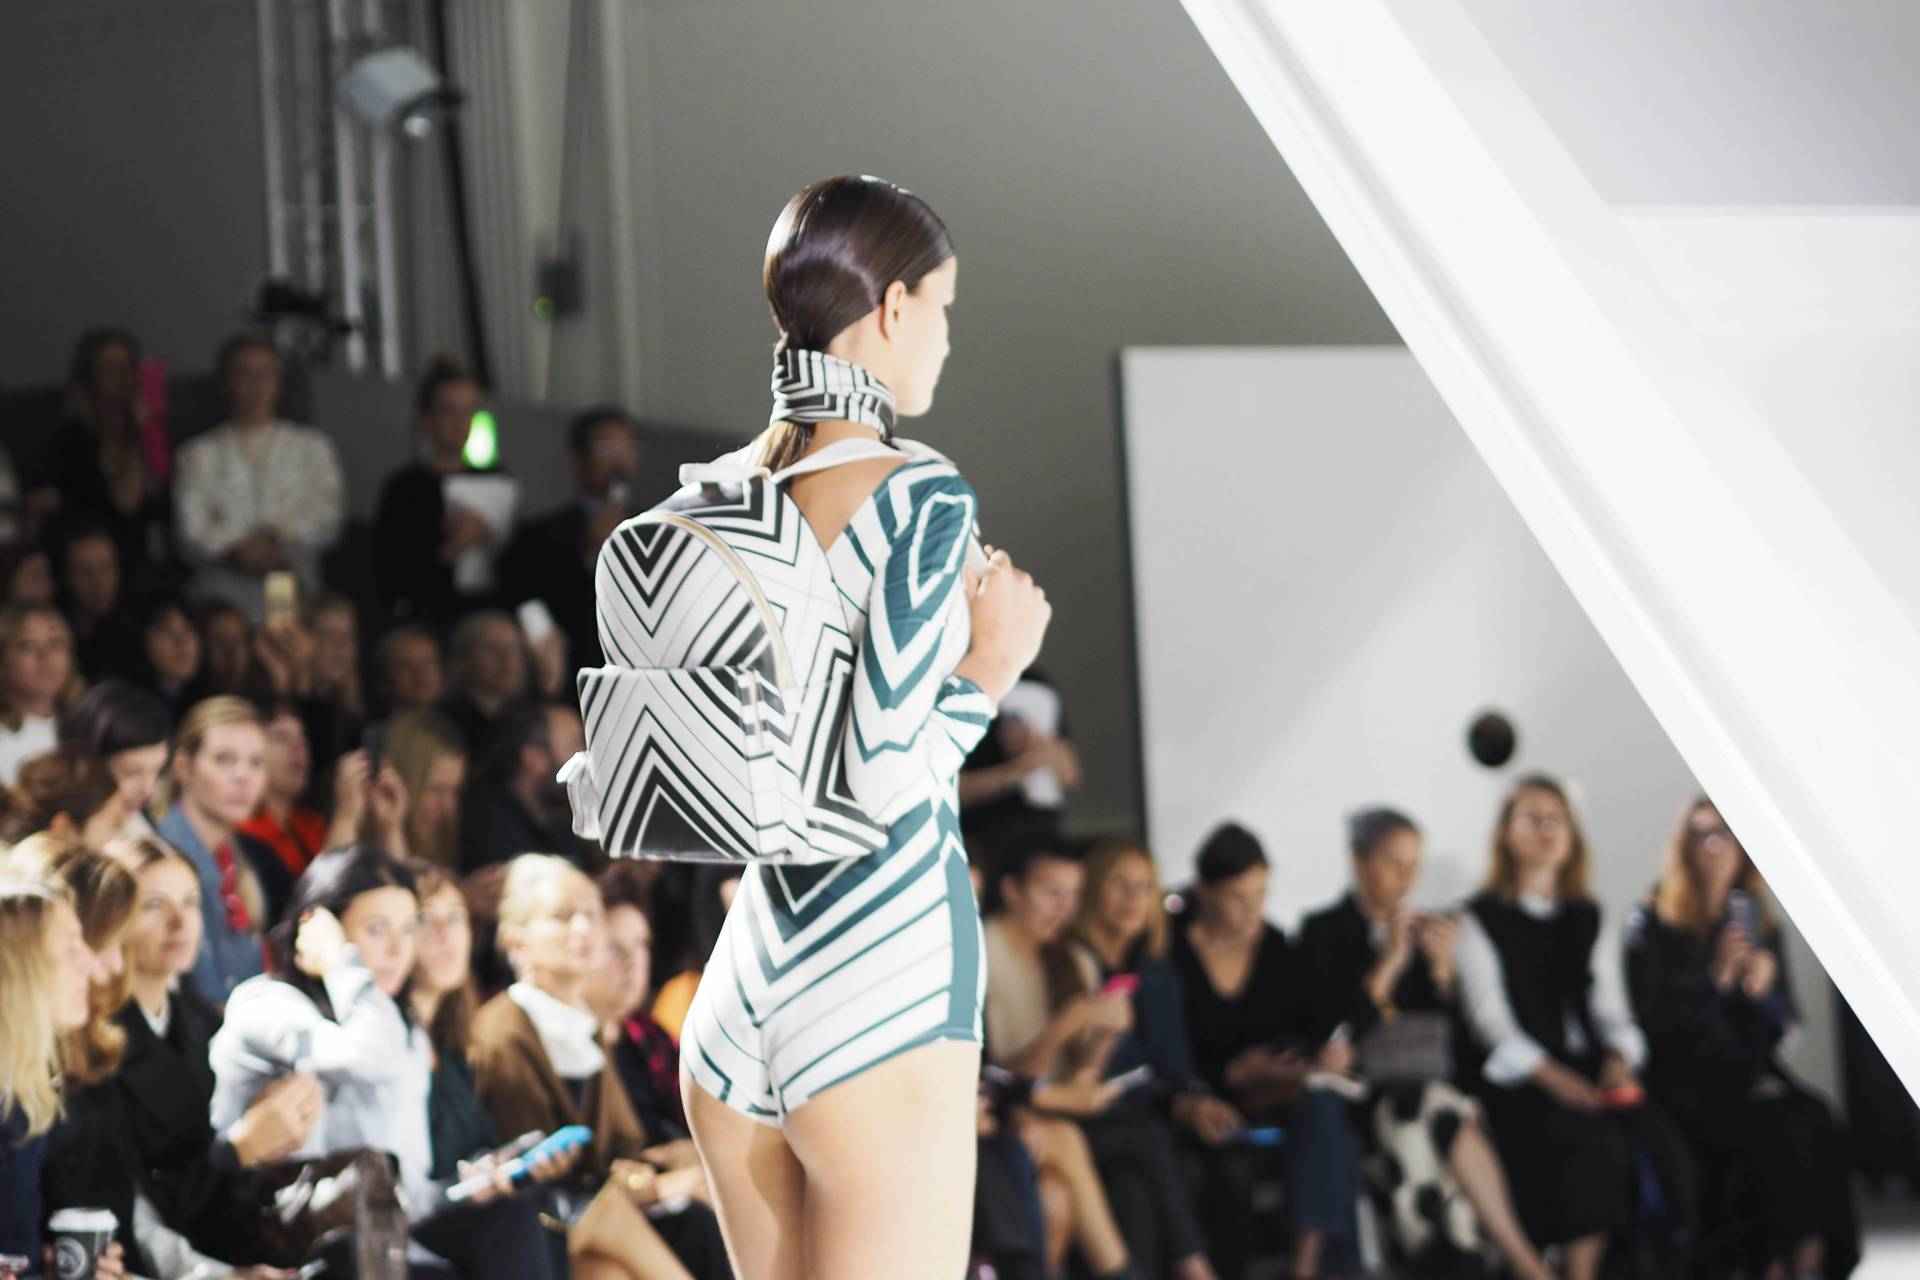 Anya Hindmarch London Fashion Week Spring Summer 2016 Inthefrow.com